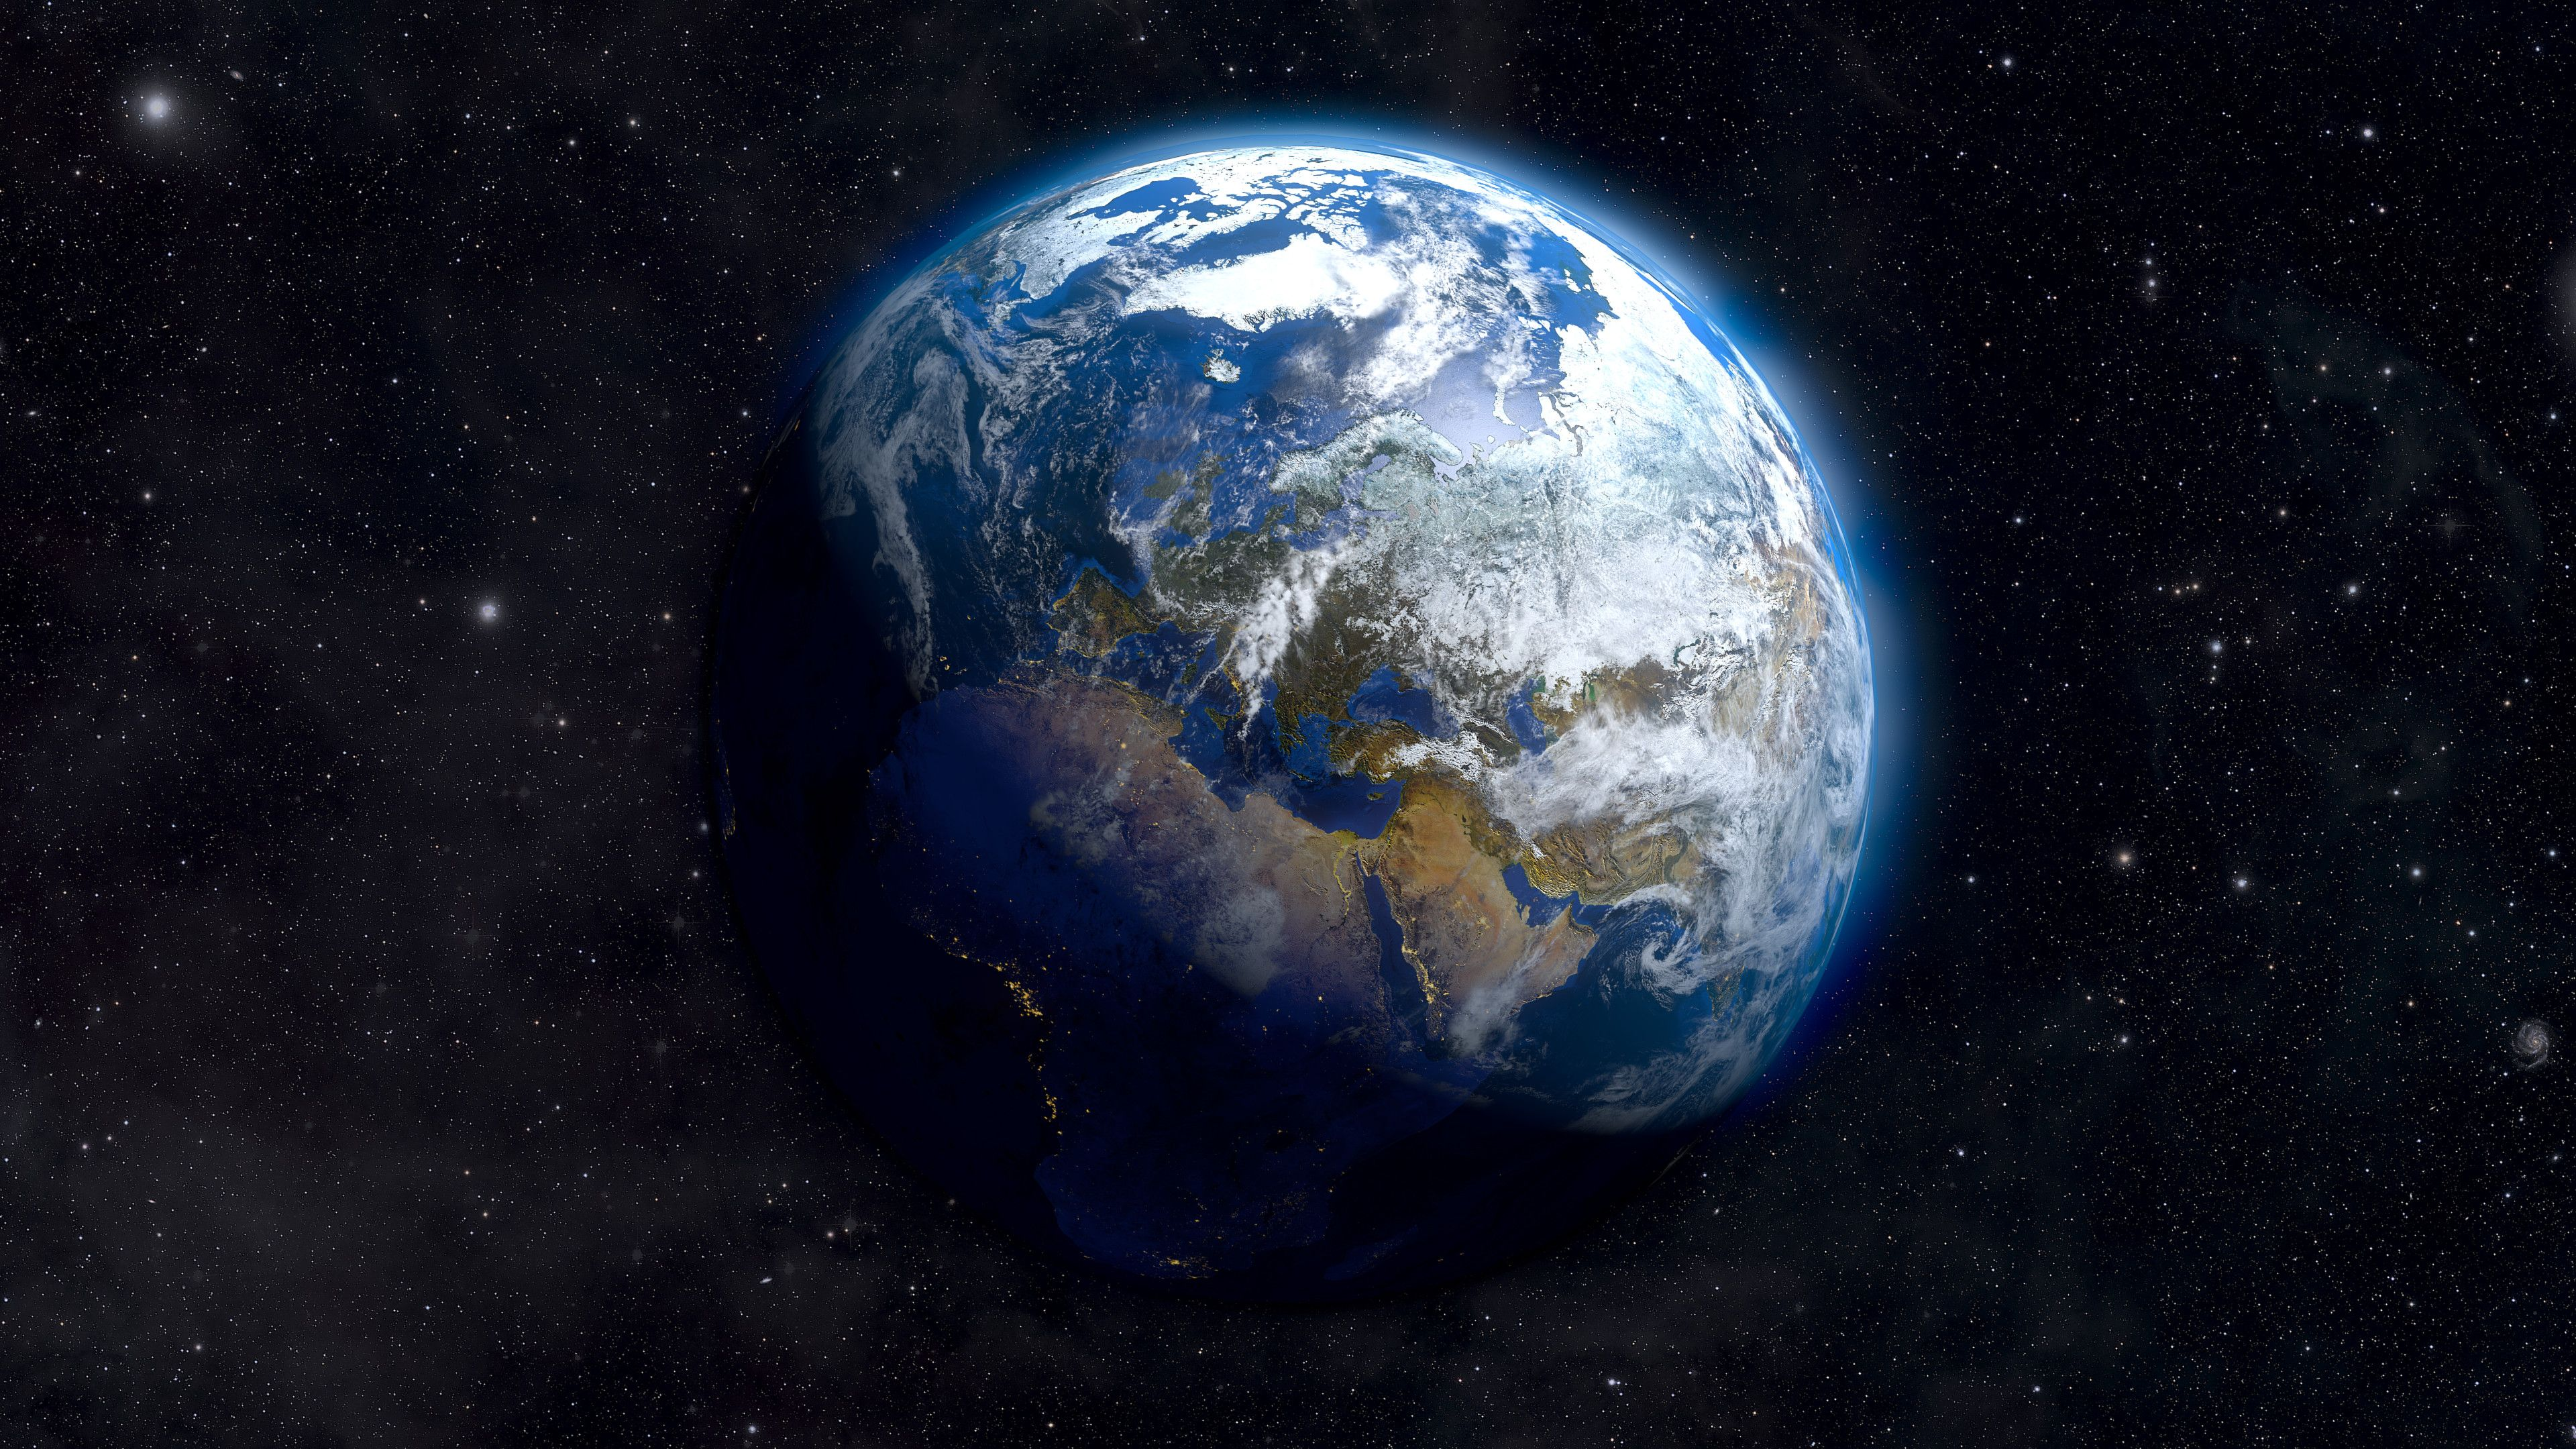 Nasa Earth Wallpaper In 2019 Wallpaper Earth Iphone